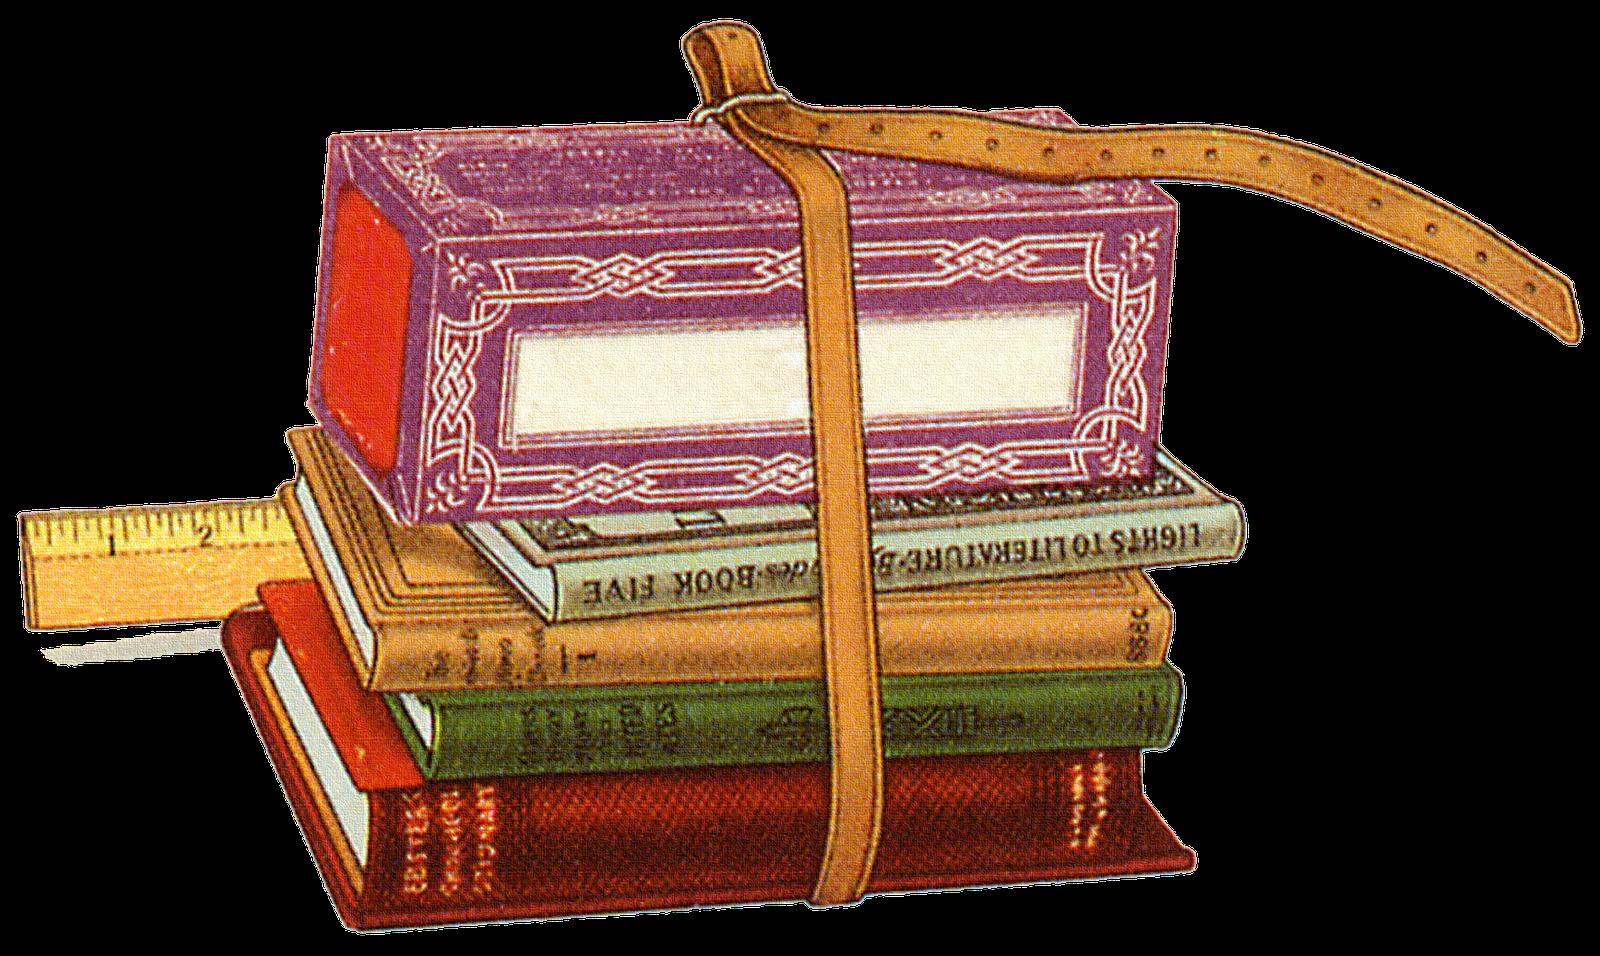 http://4.bp.blogspot.com/_cNYiQ_wdb2g/TIFh7QAJv2I/AAAAAAAABLU/DeuPD_2BWZs/s1600/vintage+back+to+school+scrapbook+embellishment.png